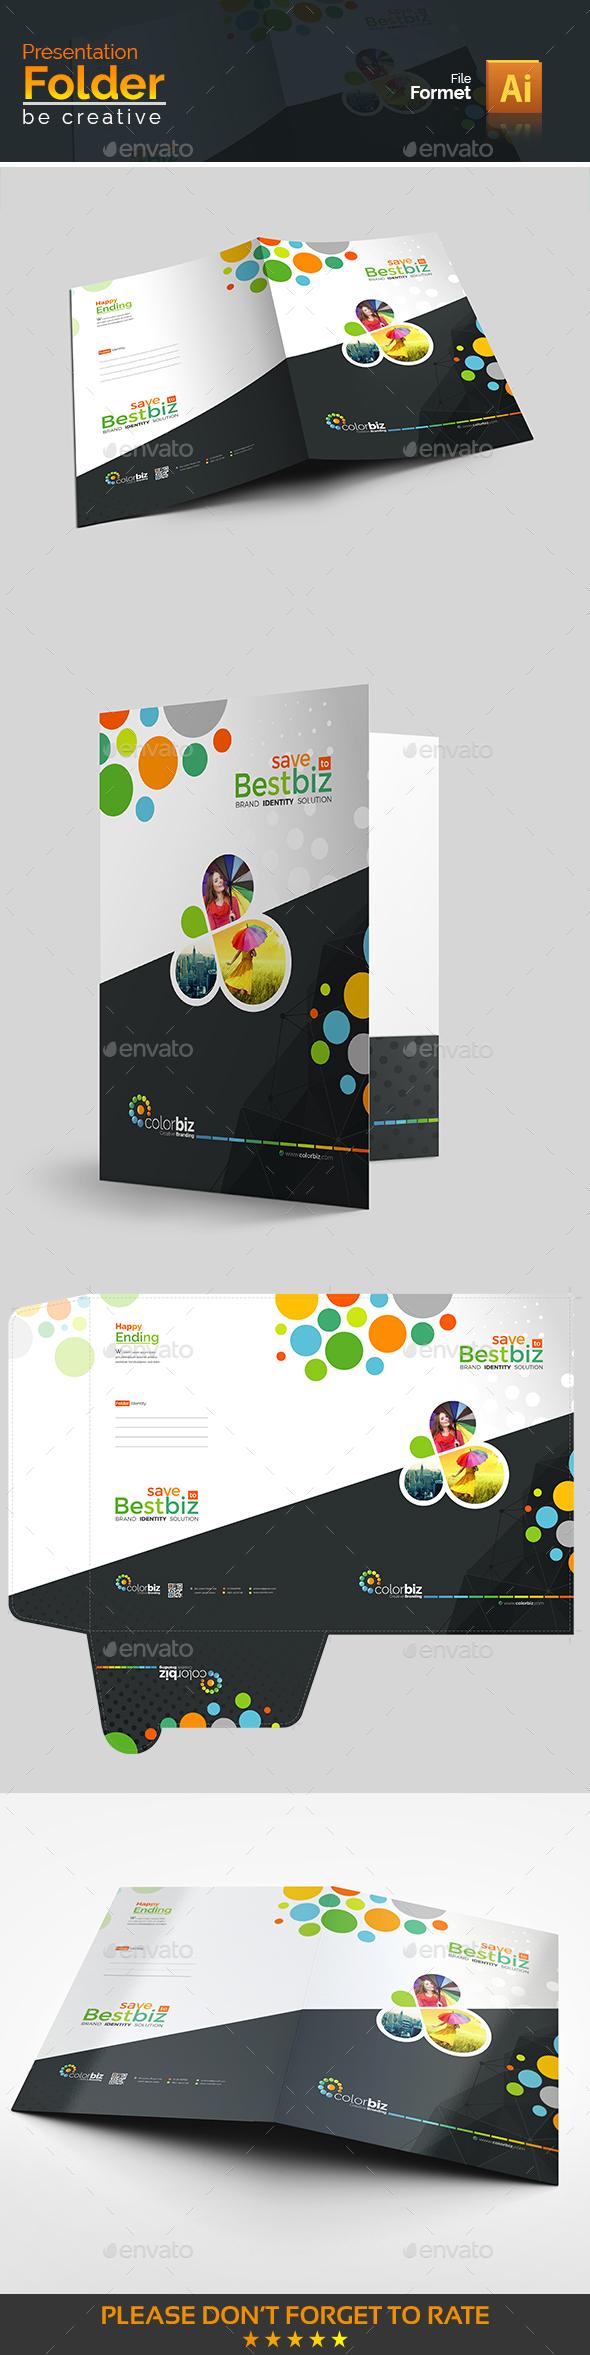 GraphicRiver Modern Presentation Folder 20648663